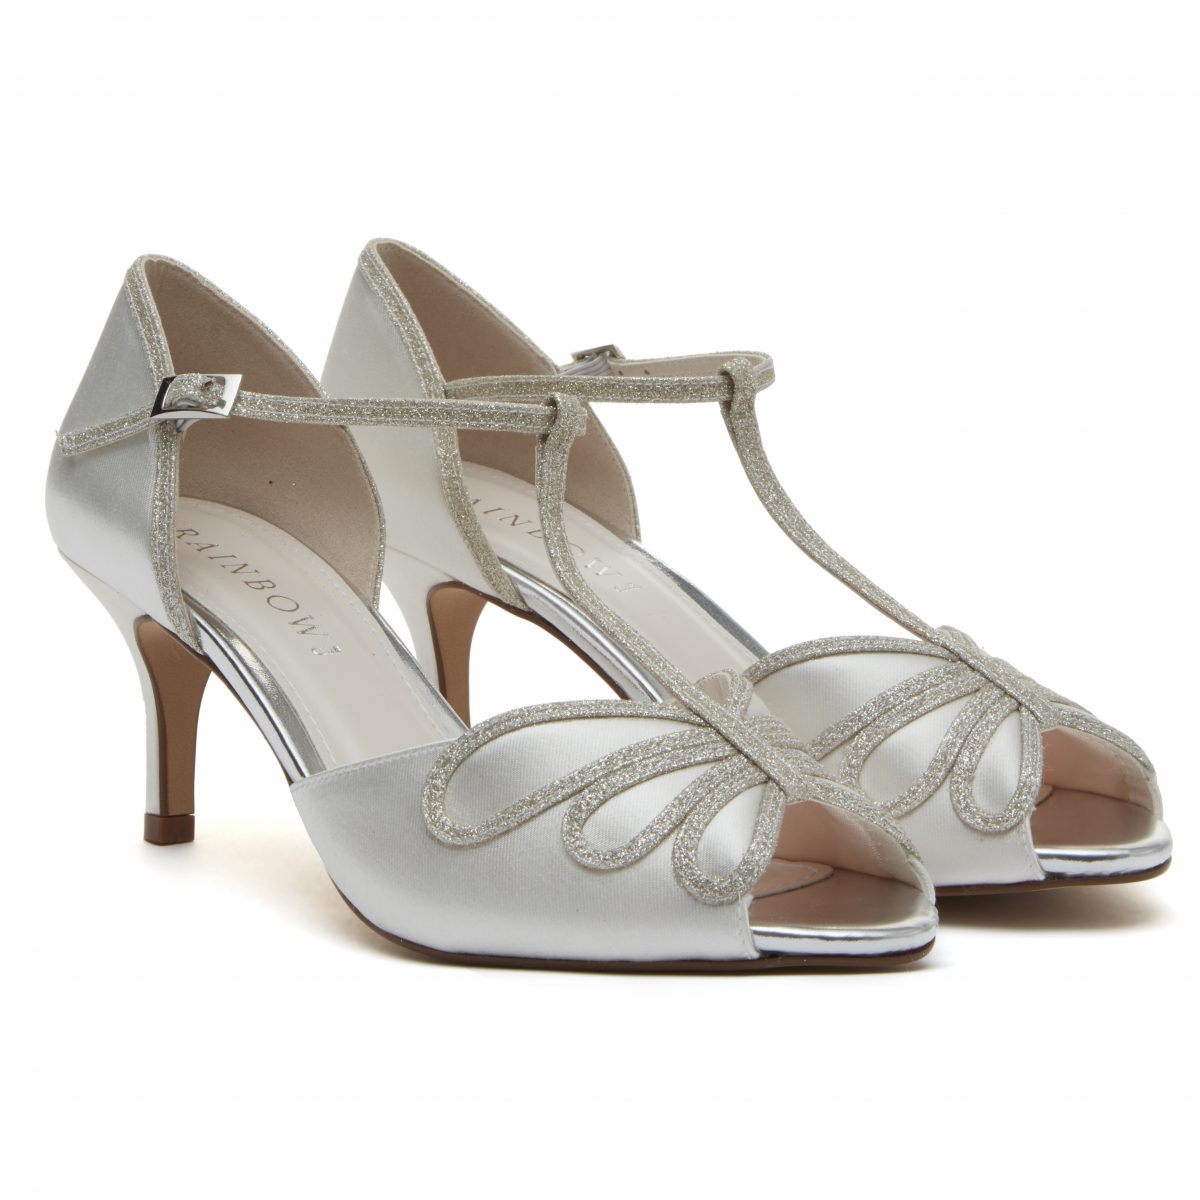 Rainbow Club Harlow - Peep Toe Satin/ Silver Shimmer Shoe 1